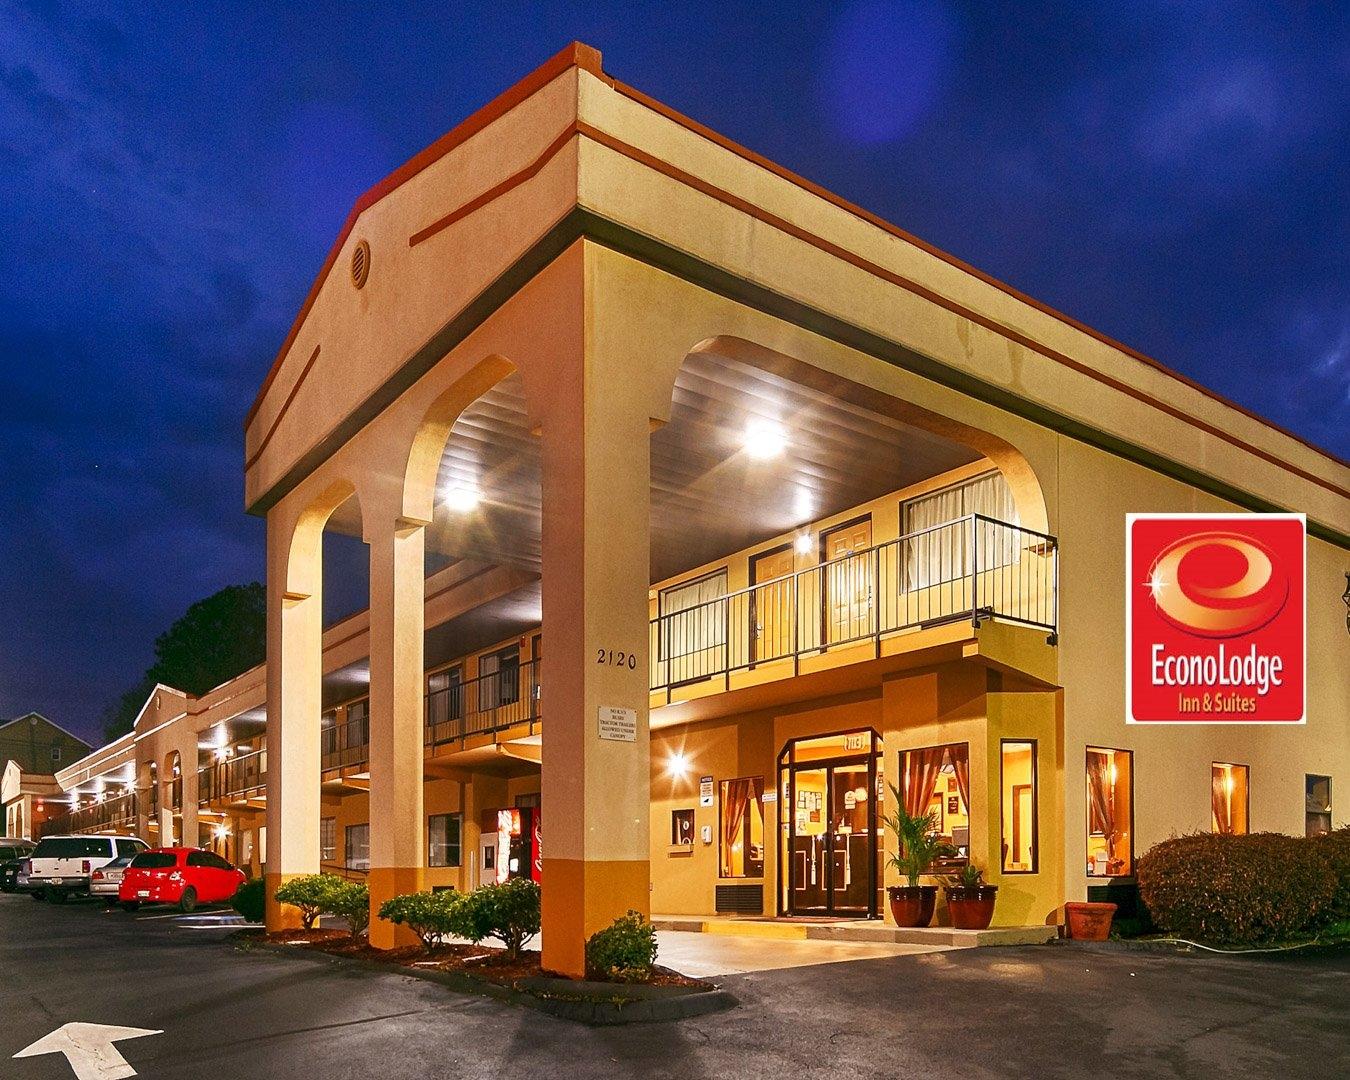 Econo Lodge Inn  U0026 Suites Near Chickamauga Battlefield In Fort Oglethorpe  Ga 30742